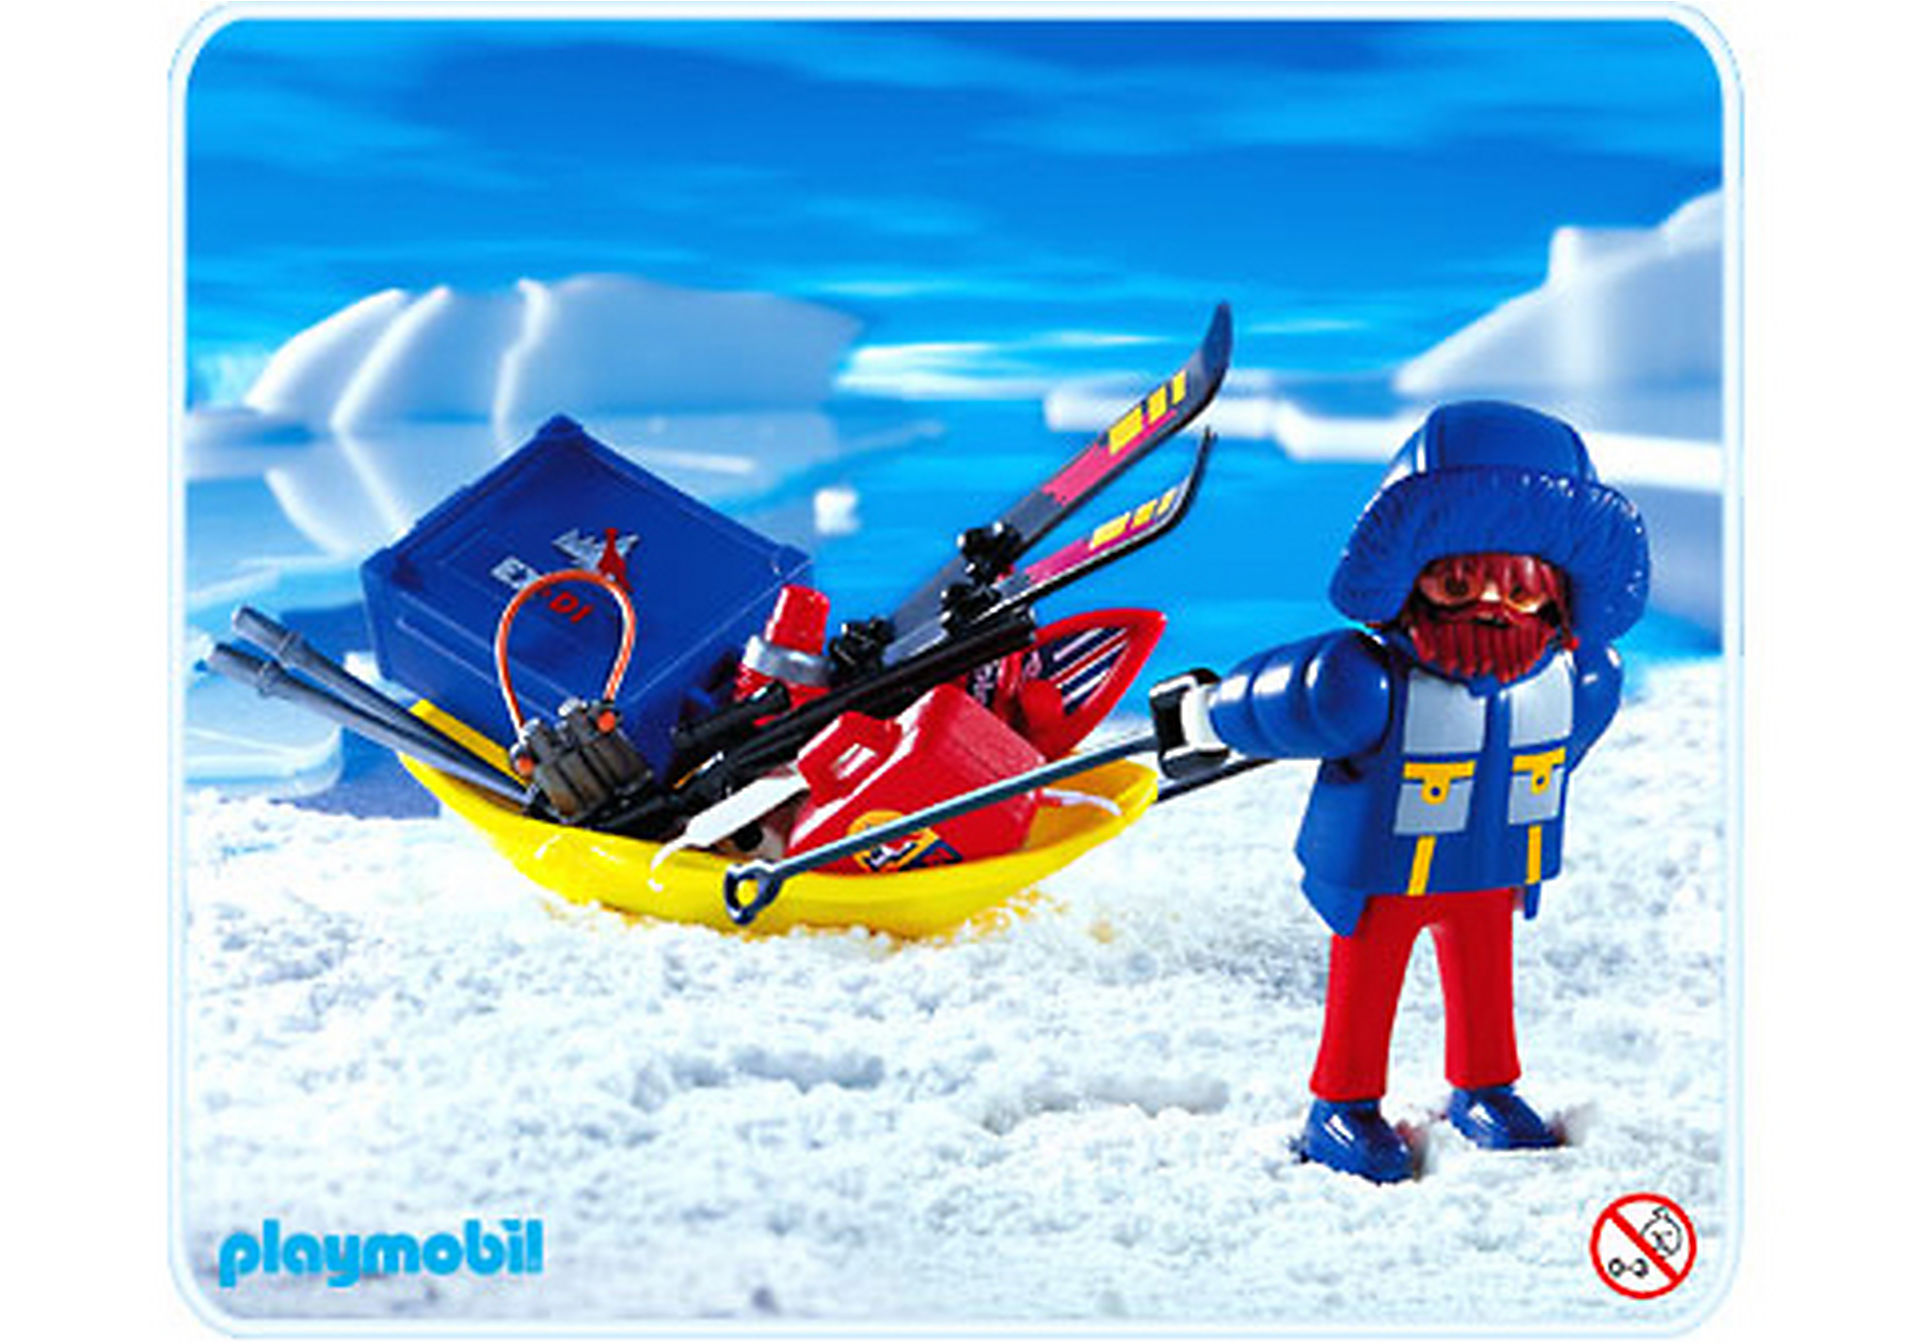 http://media.playmobil.com/i/playmobil/3194-A_product_detail/Explorateur polaire / traîneau